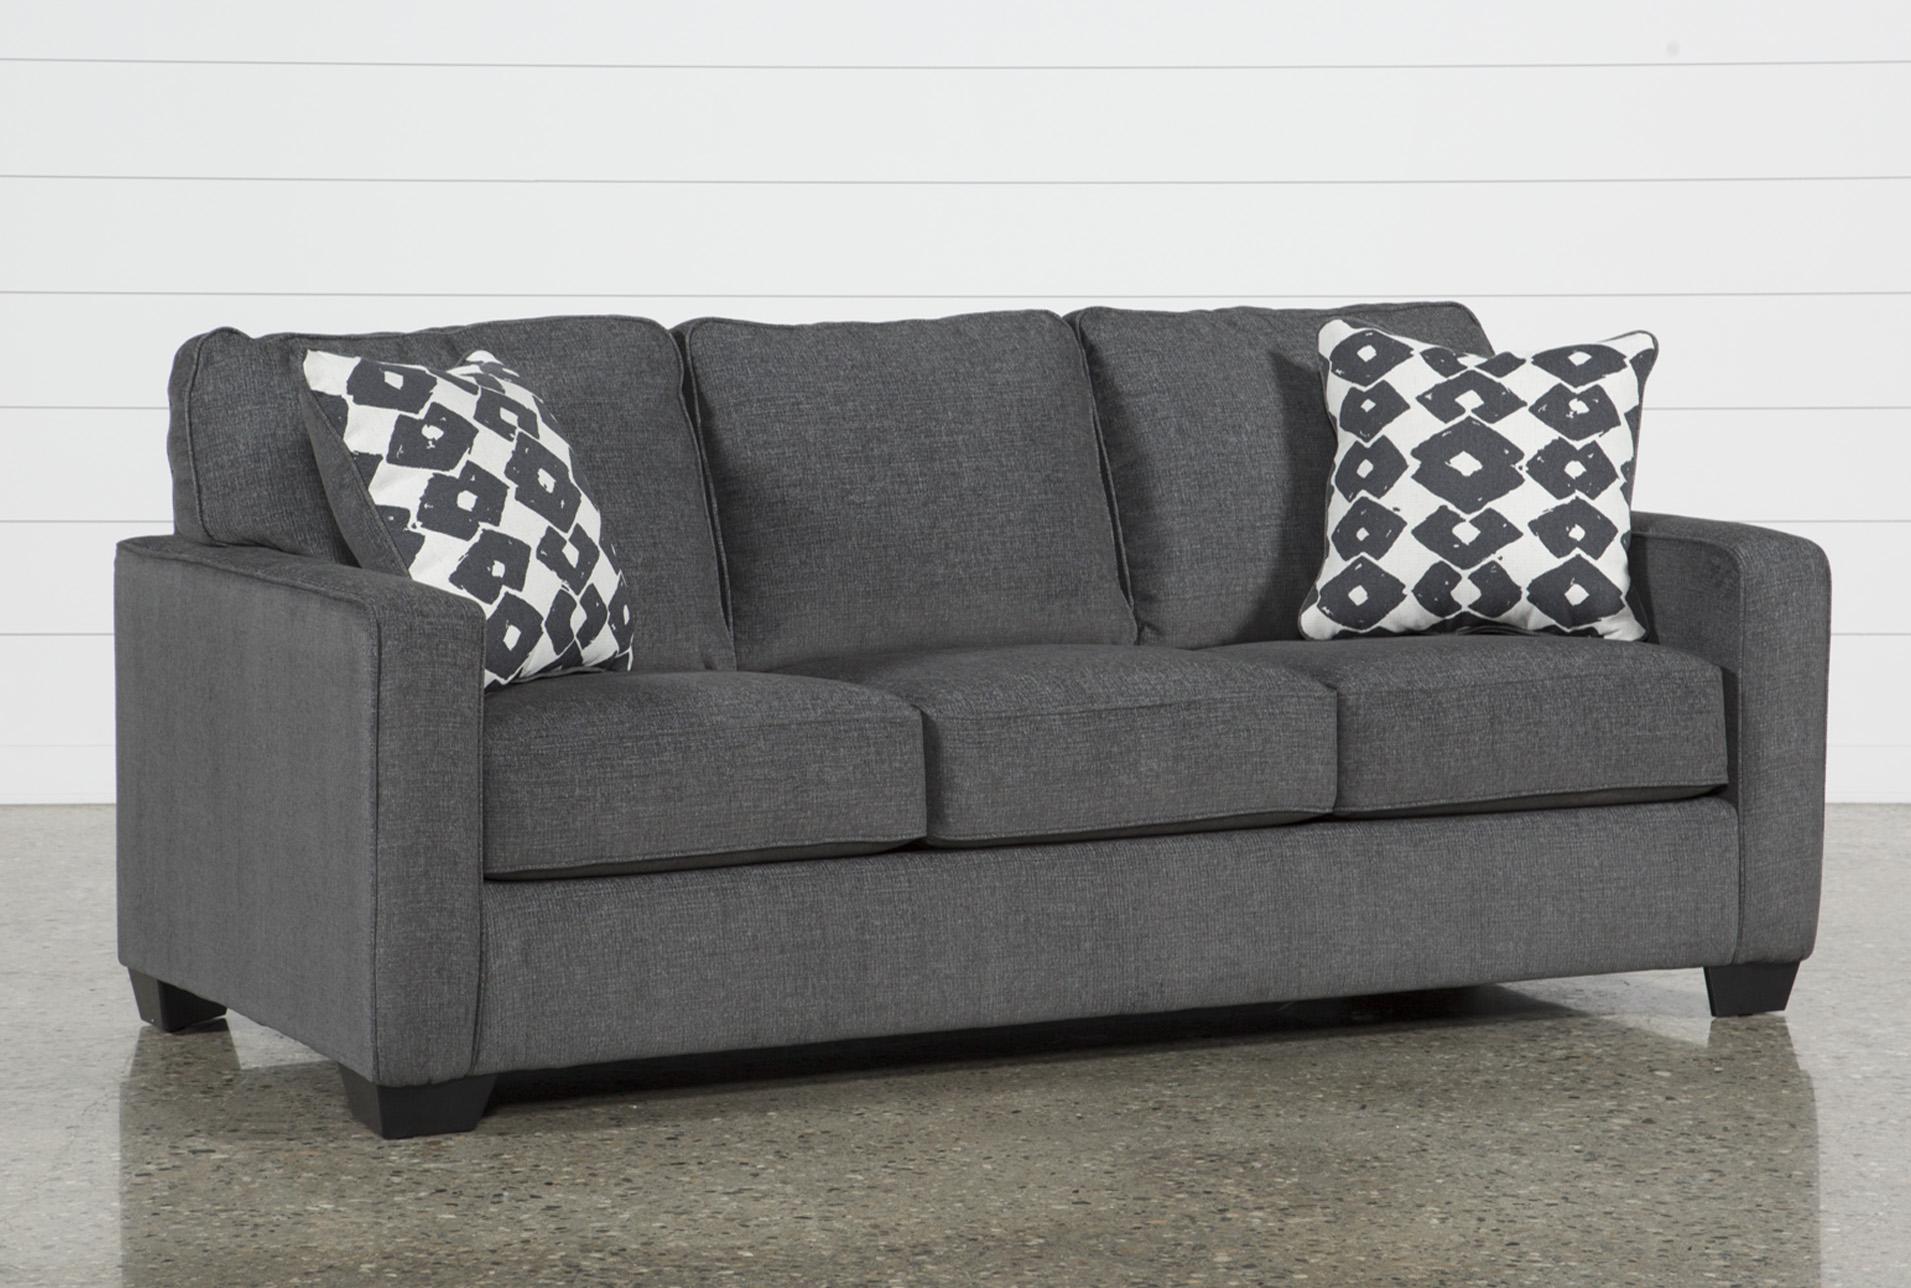 Turdur Queen Sofa Sleeper | Living Spaces